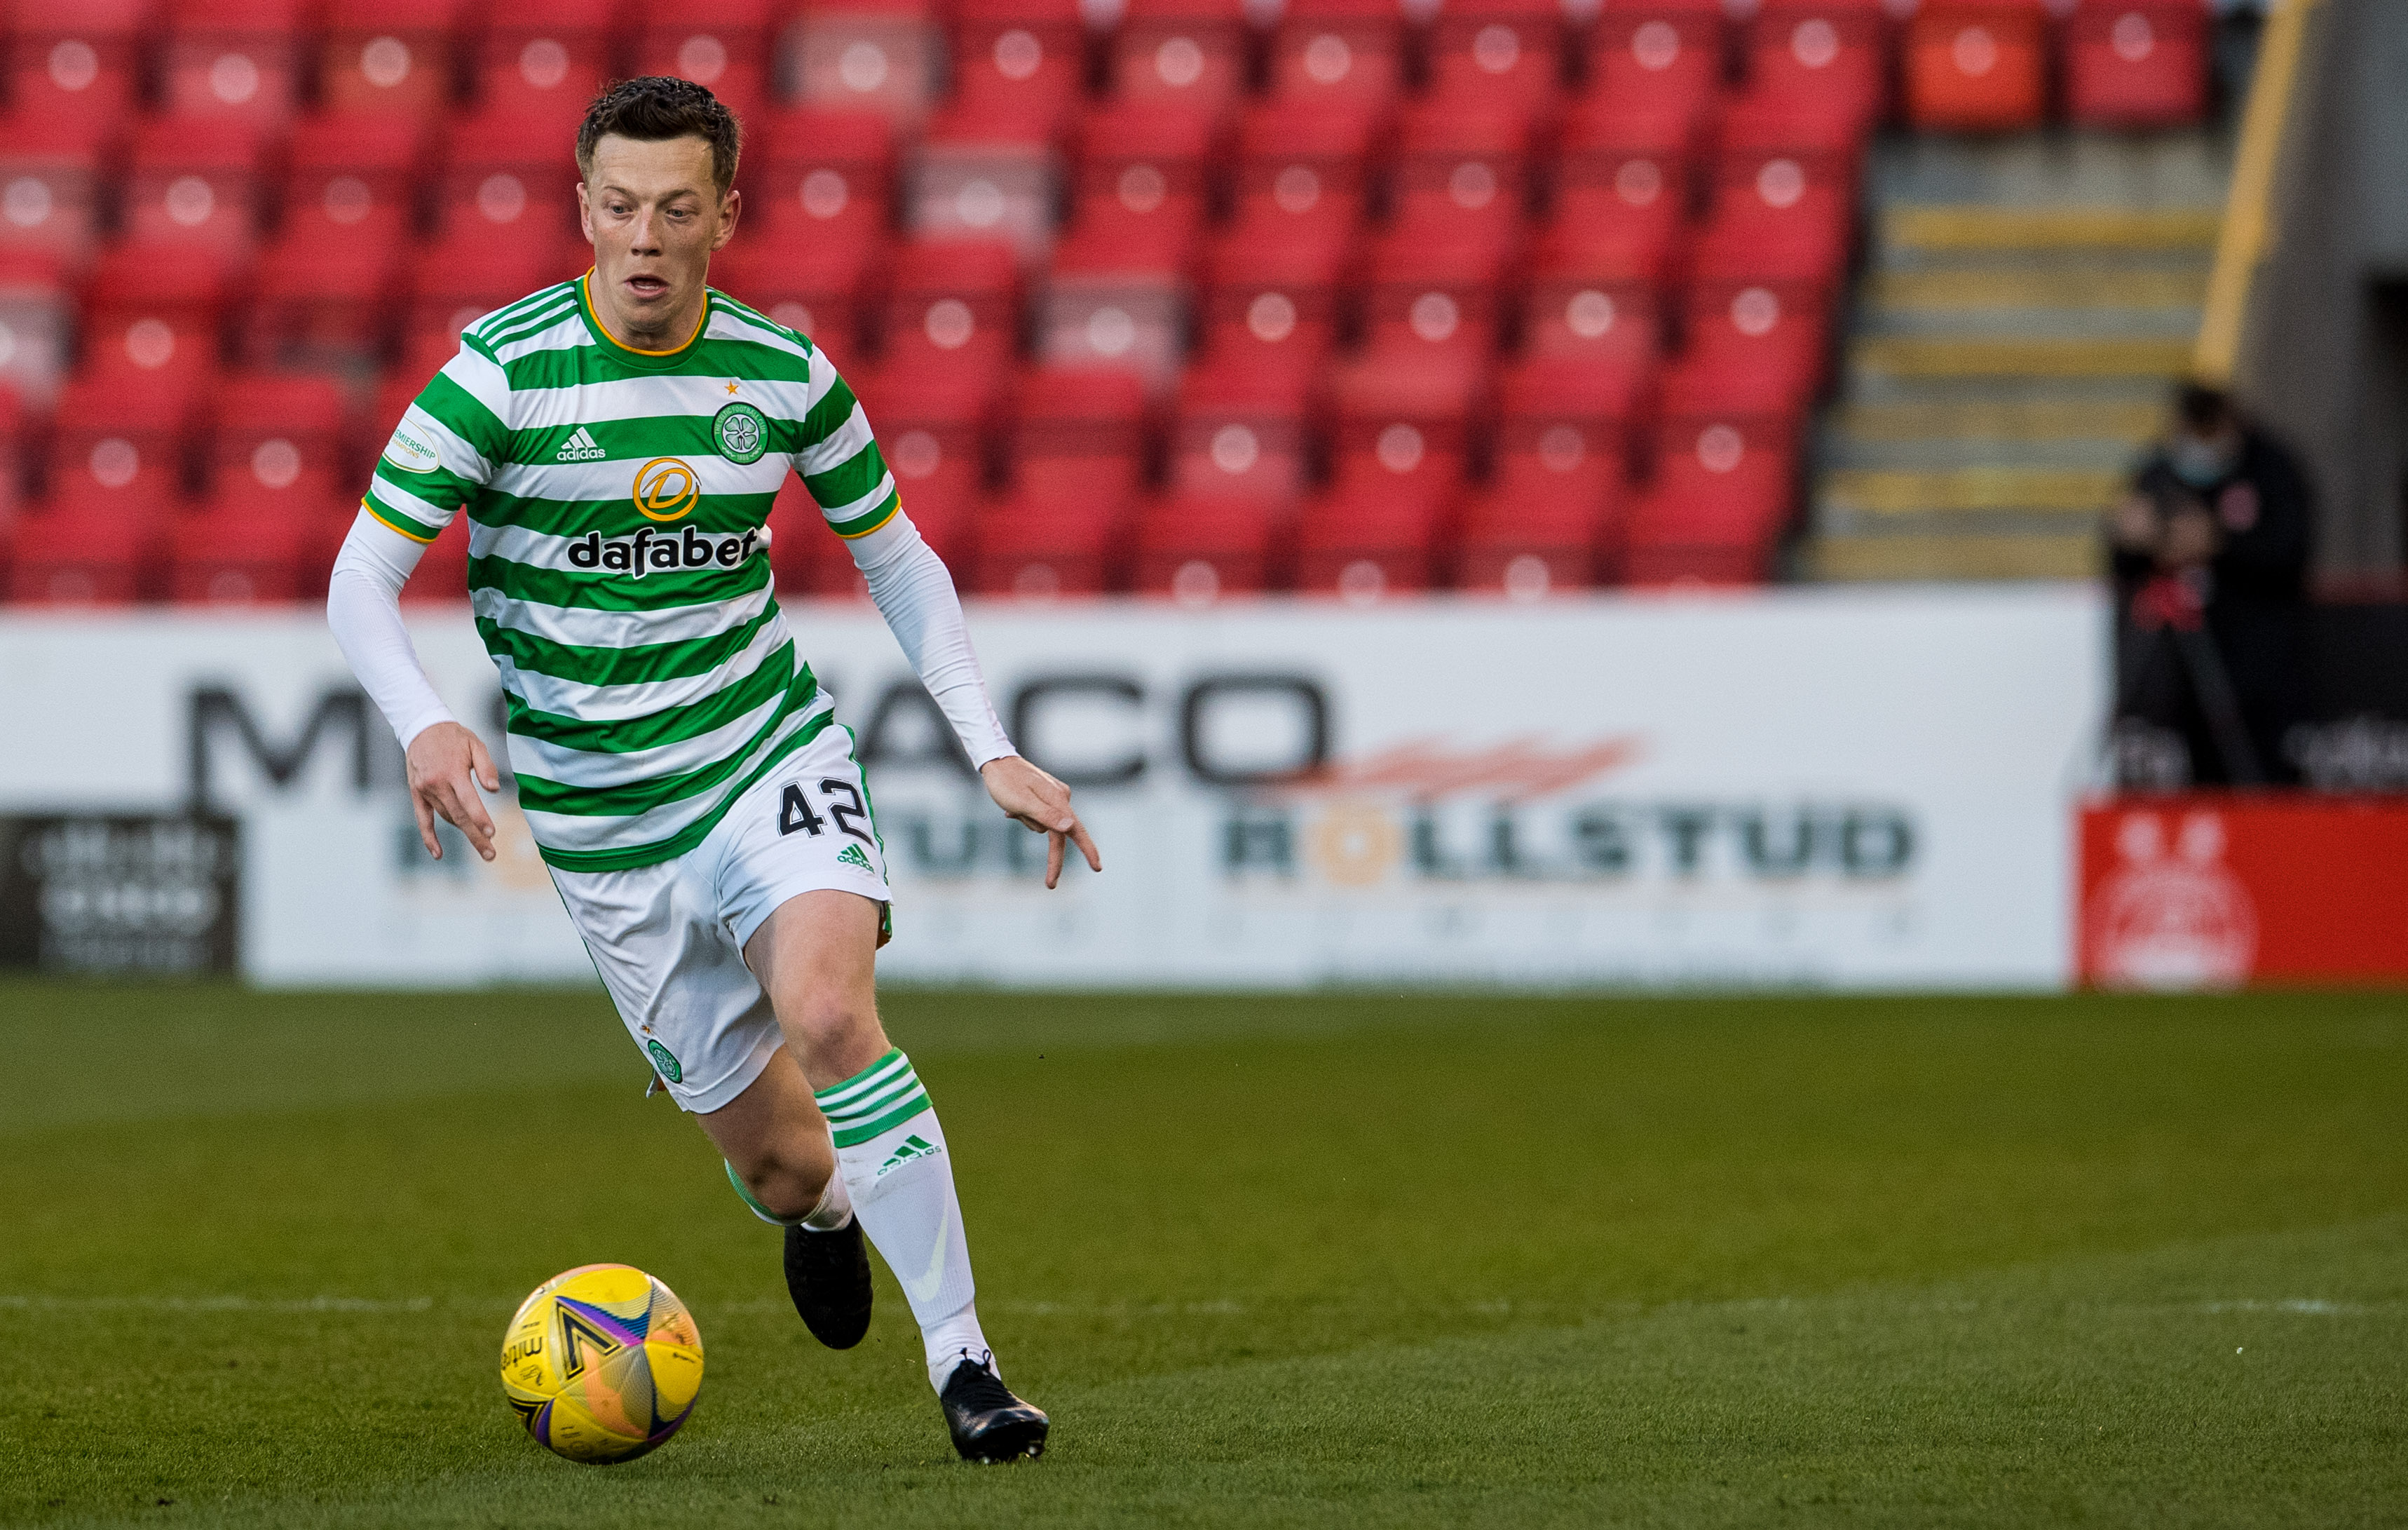 Aberdeen v Celtic - Scottish Premiership